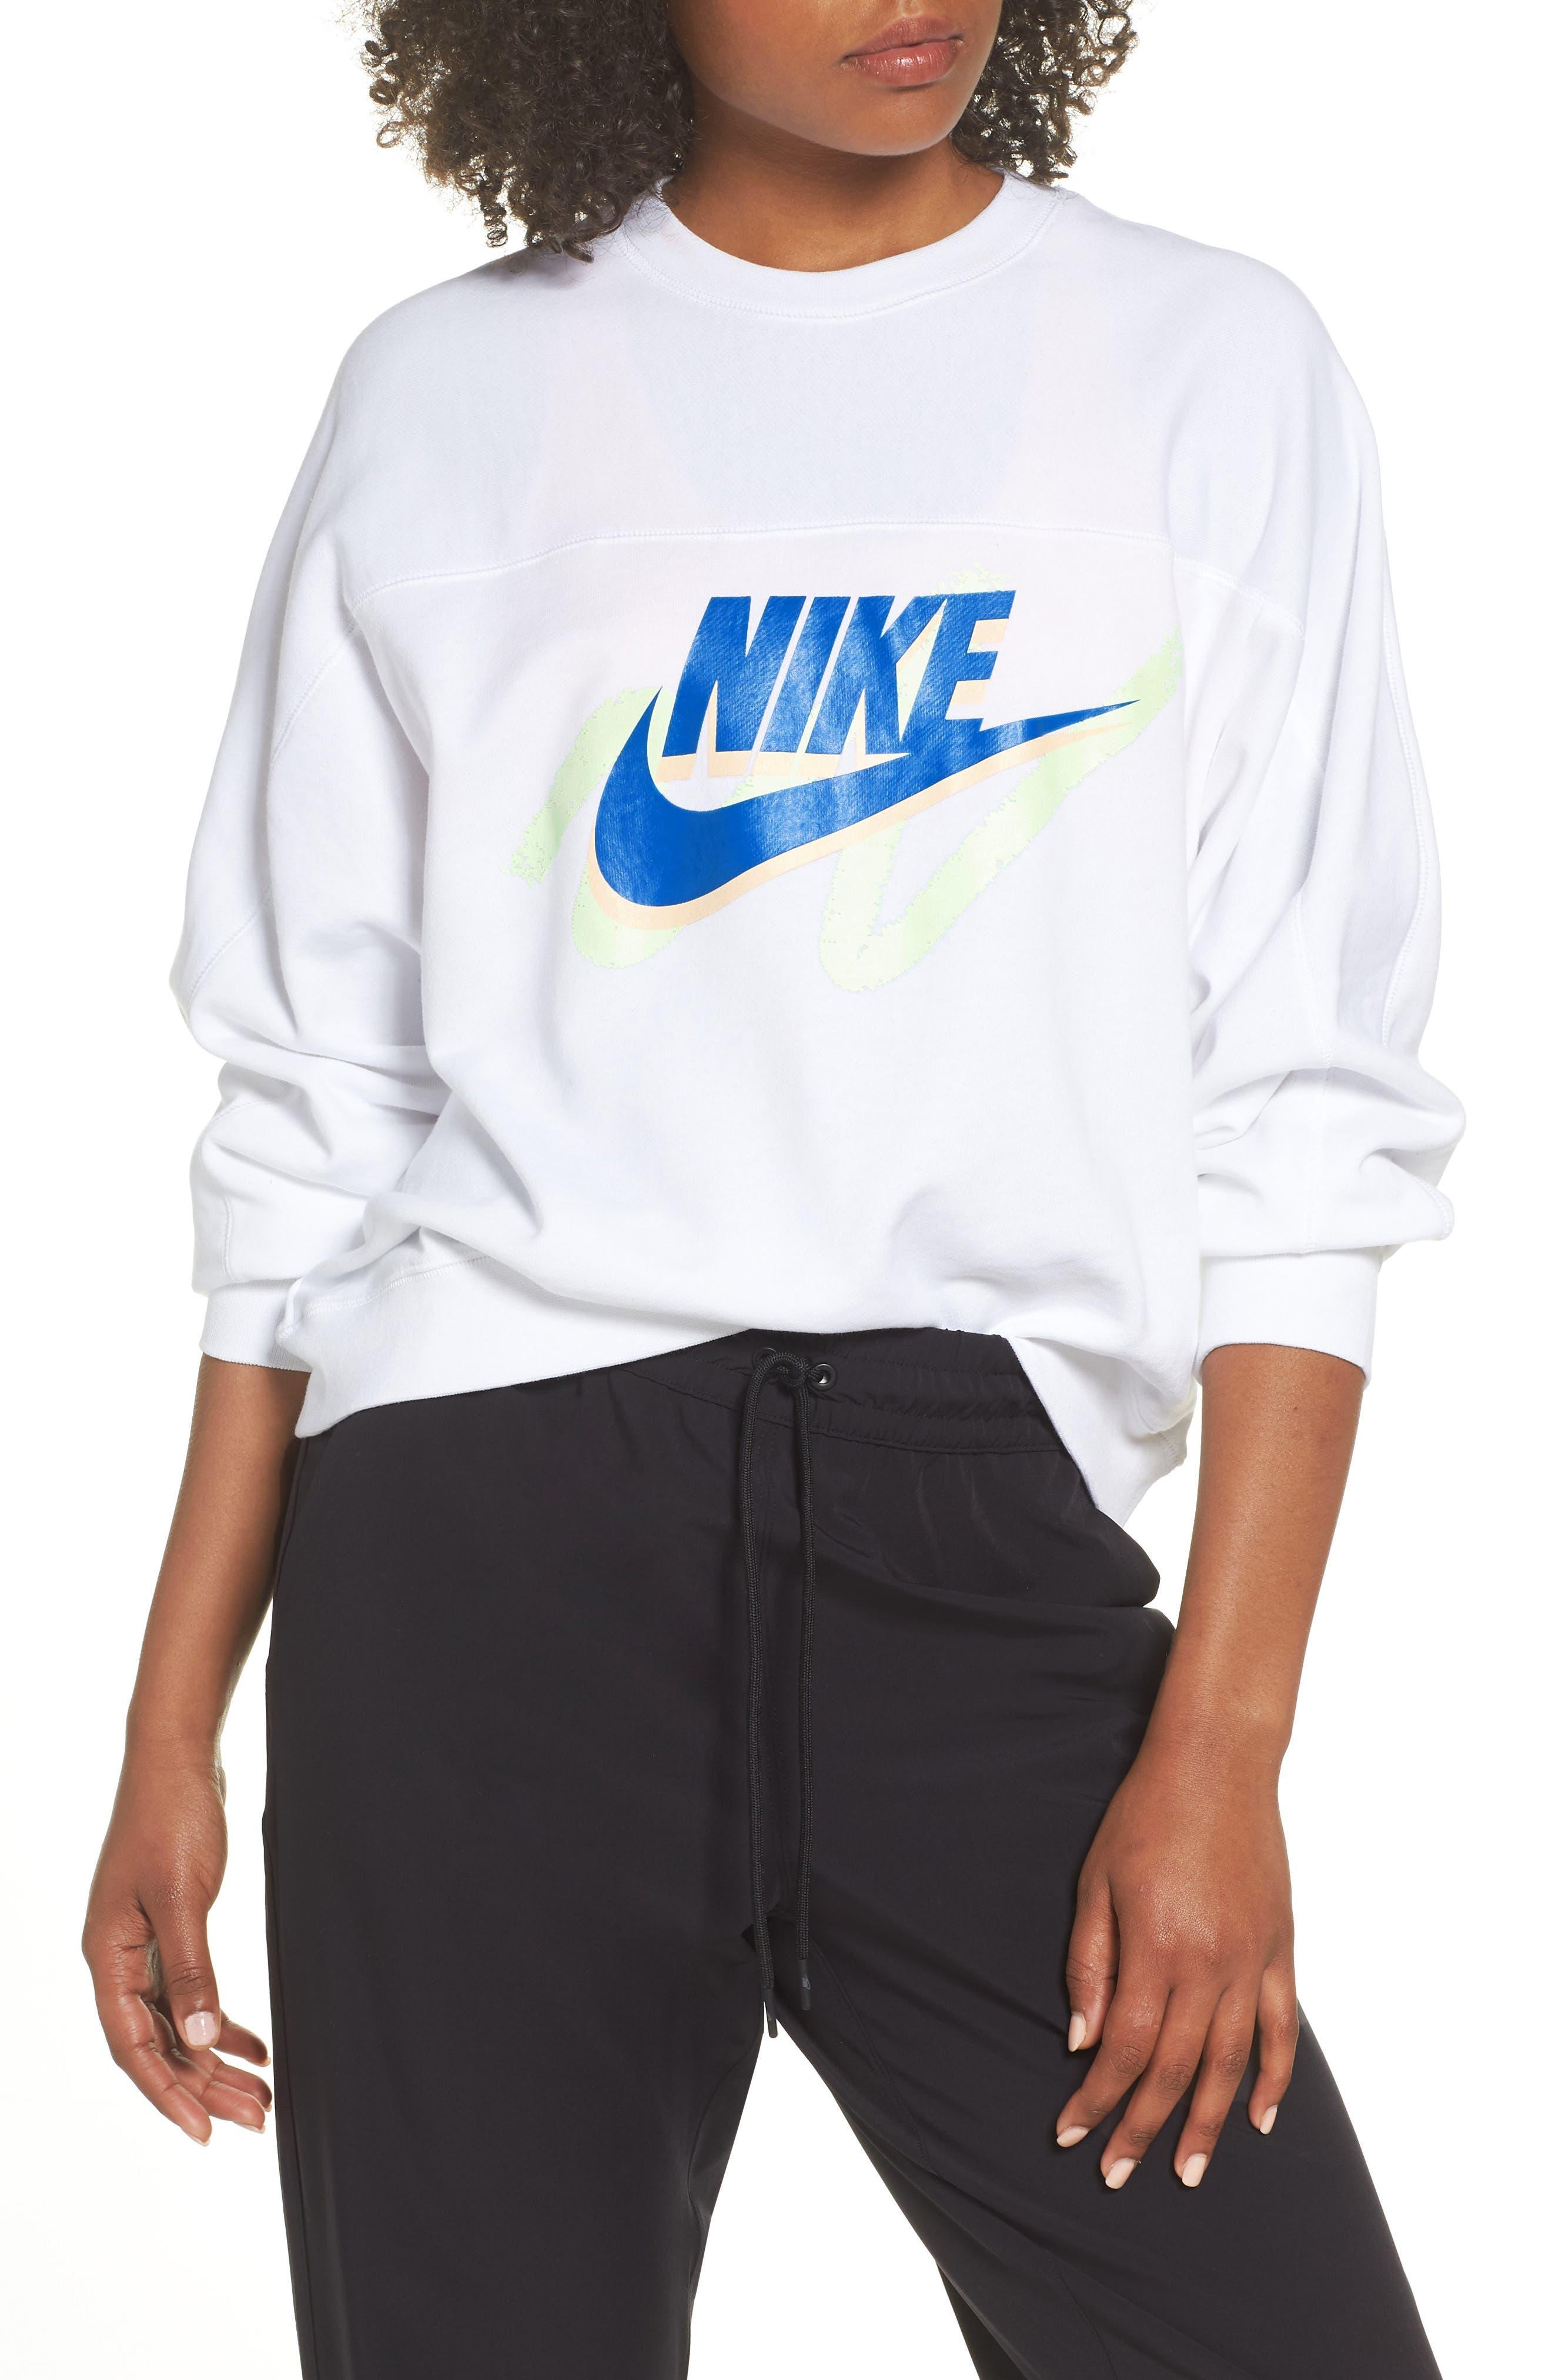 Sportswear Archive Women's Long Sleeve Crewneck Tee,                             Alternate thumbnail 3, color,                             WHITE/ WHITE/ WHITE